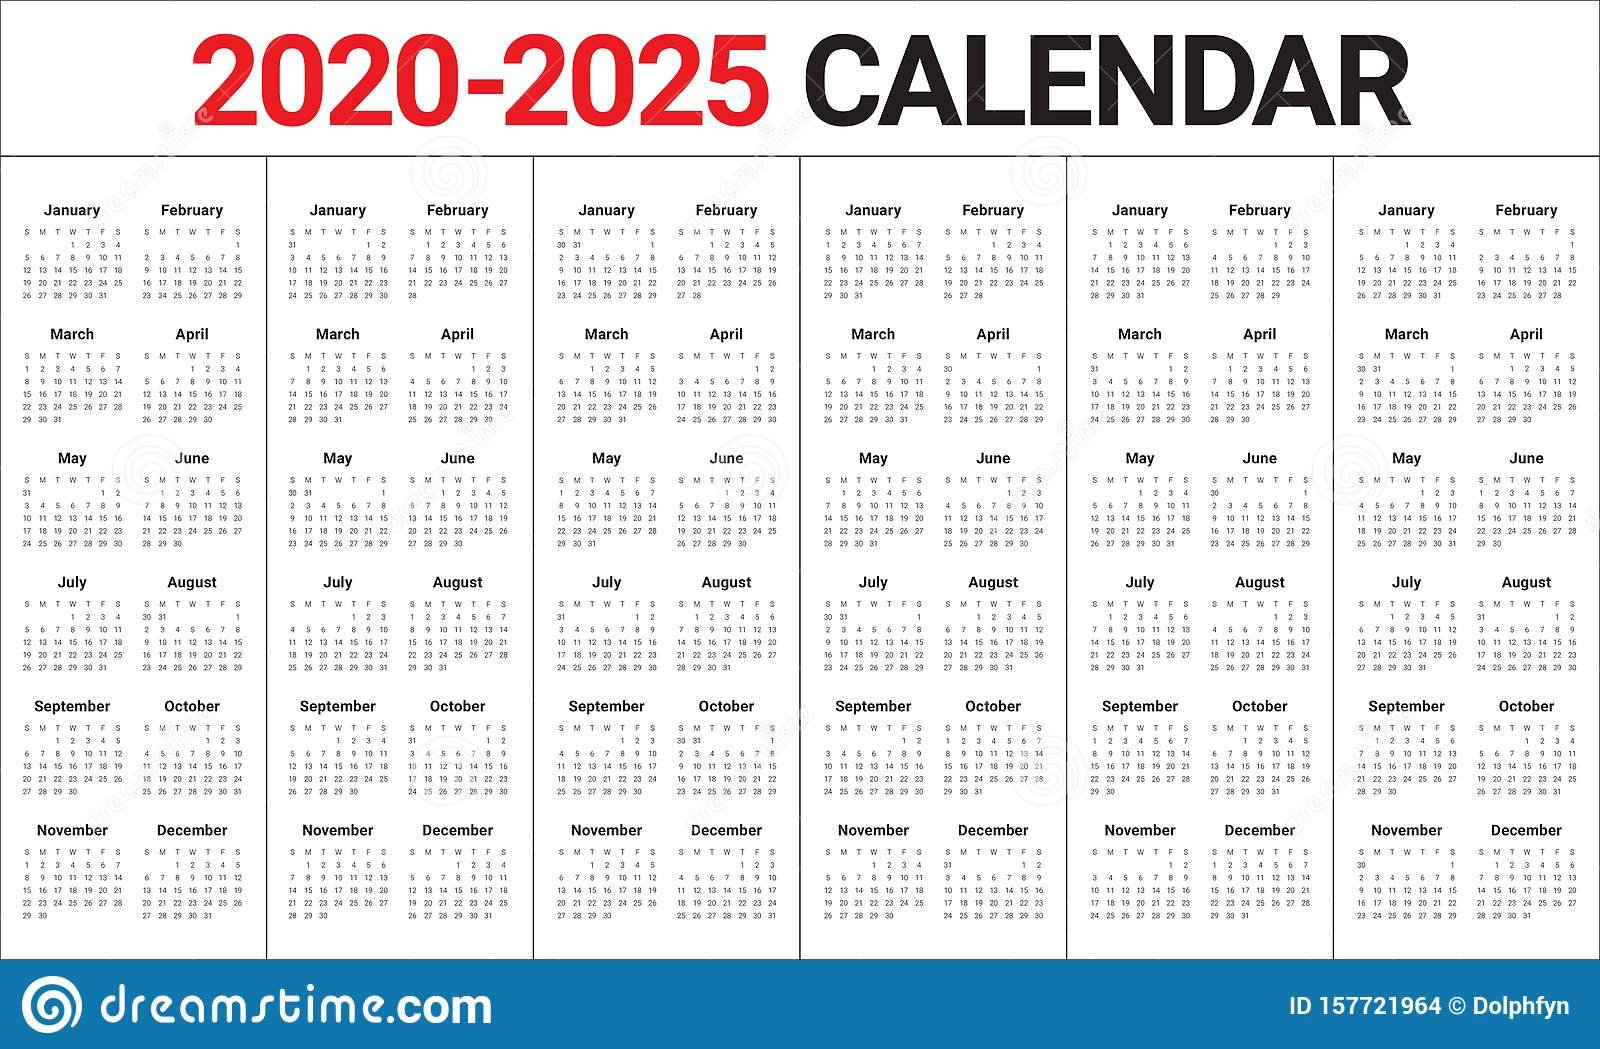 Year 2020 2021 2022 2023 2024 2025 Calendar Vector Design Five Year Calendar Image